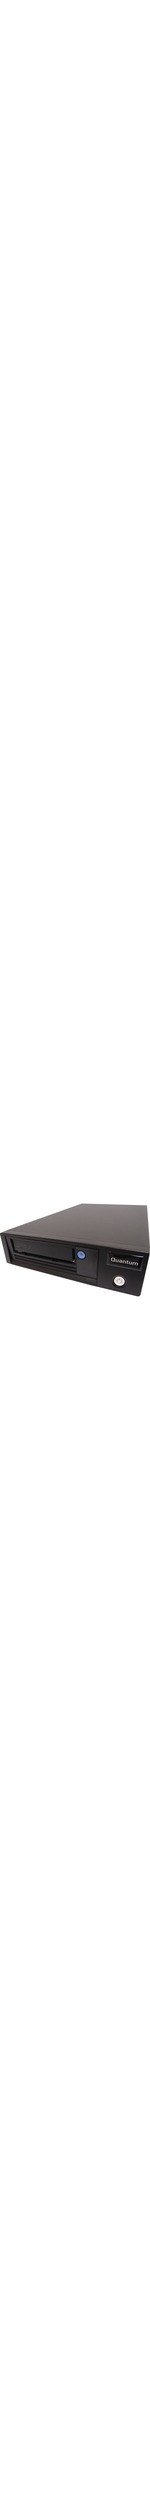 Quantum LTO-6 Tape Drive - 2.50 TB Native/6.25 TB Compressed - 6Gb/s SAS - 1/2H Height - Internal